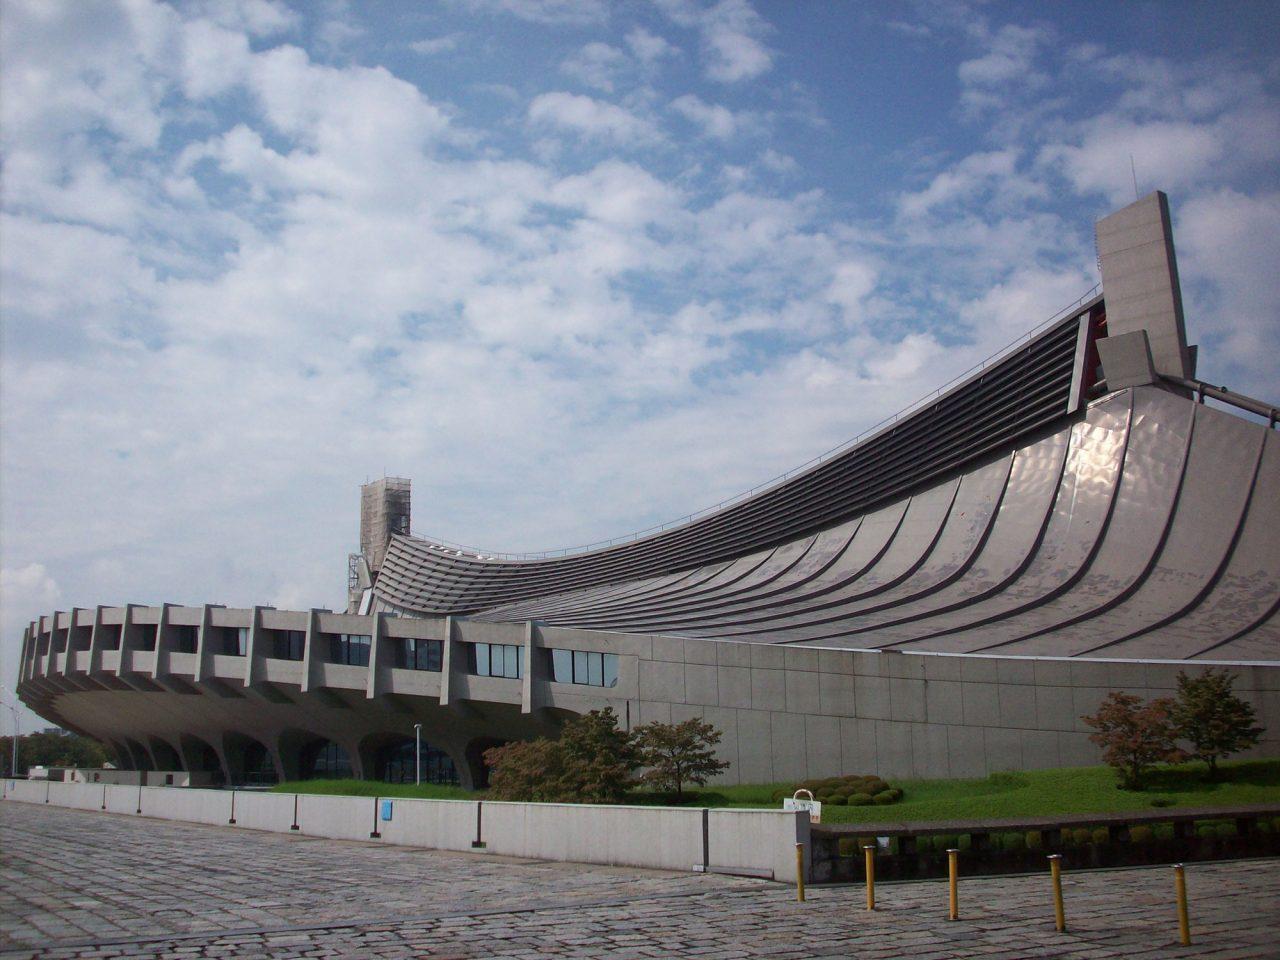 2021年8月2日、重要文化財に指定された代々木体育館(設計者:丹下健三/1964年竣工)